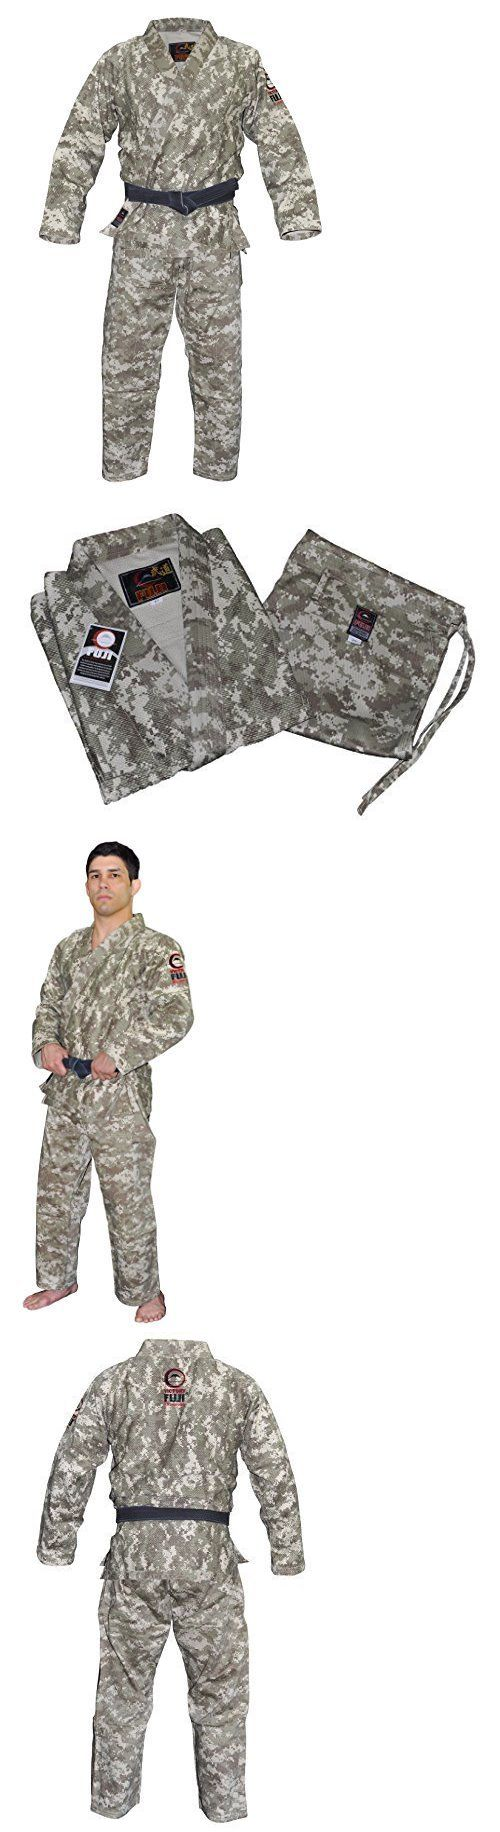 Jackets 179771: Fuji Bjj Gi Uniform Digital Camo A2 Mens Martial Arts Uniform Jacket, New -> BUY IT NOW ONLY: $165.58 on eBay!